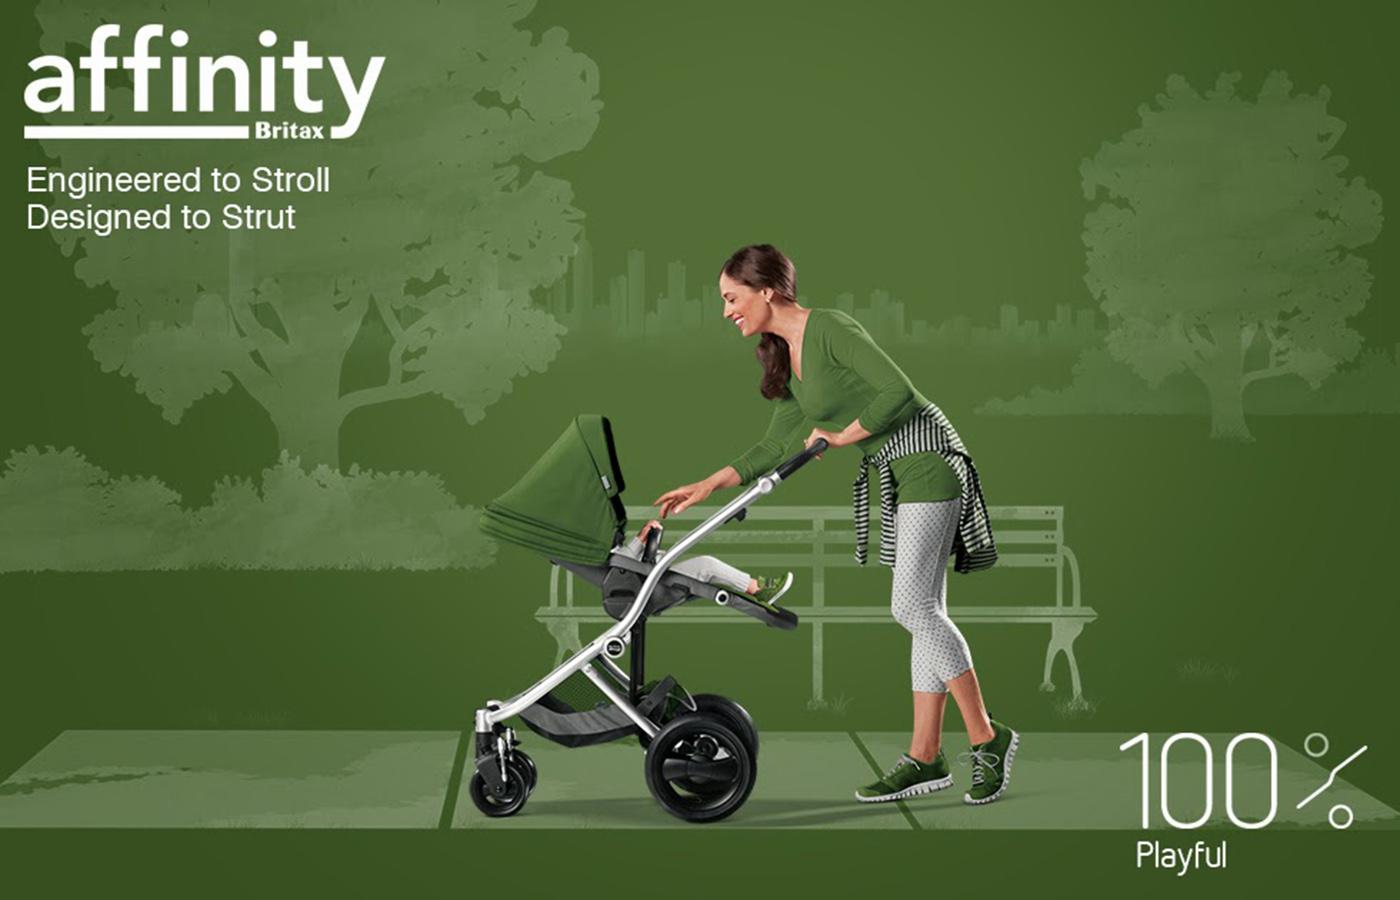 affinity-stroller-cactus-green (2016_08_04 16_24_06 UTC).jpg